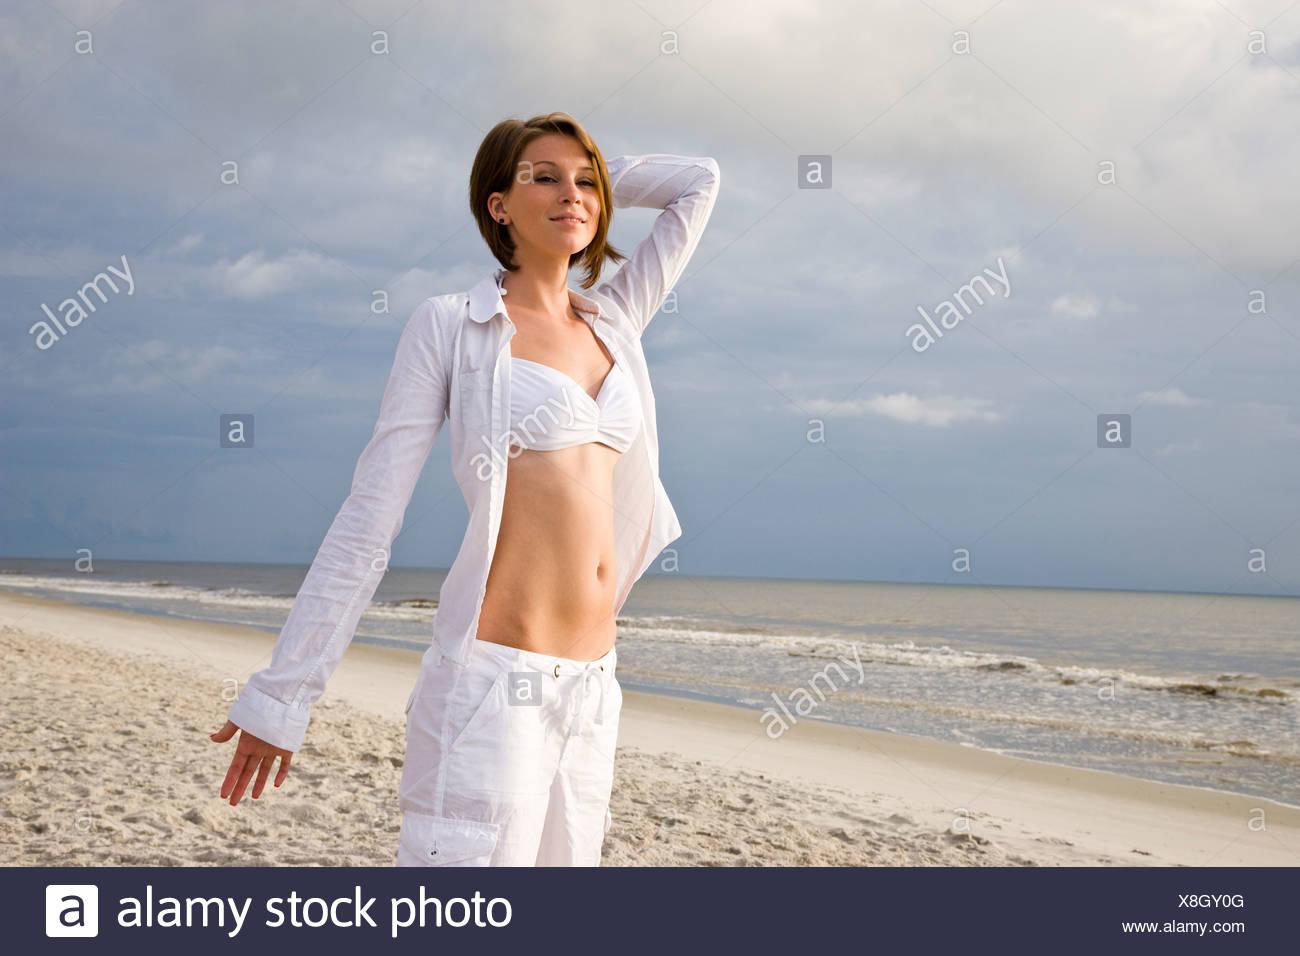 Retrato De Joven Mujer Feliz En Bikini Blanco Y Pantalones De Pie En La Playa Fotografia De Stock Alamy